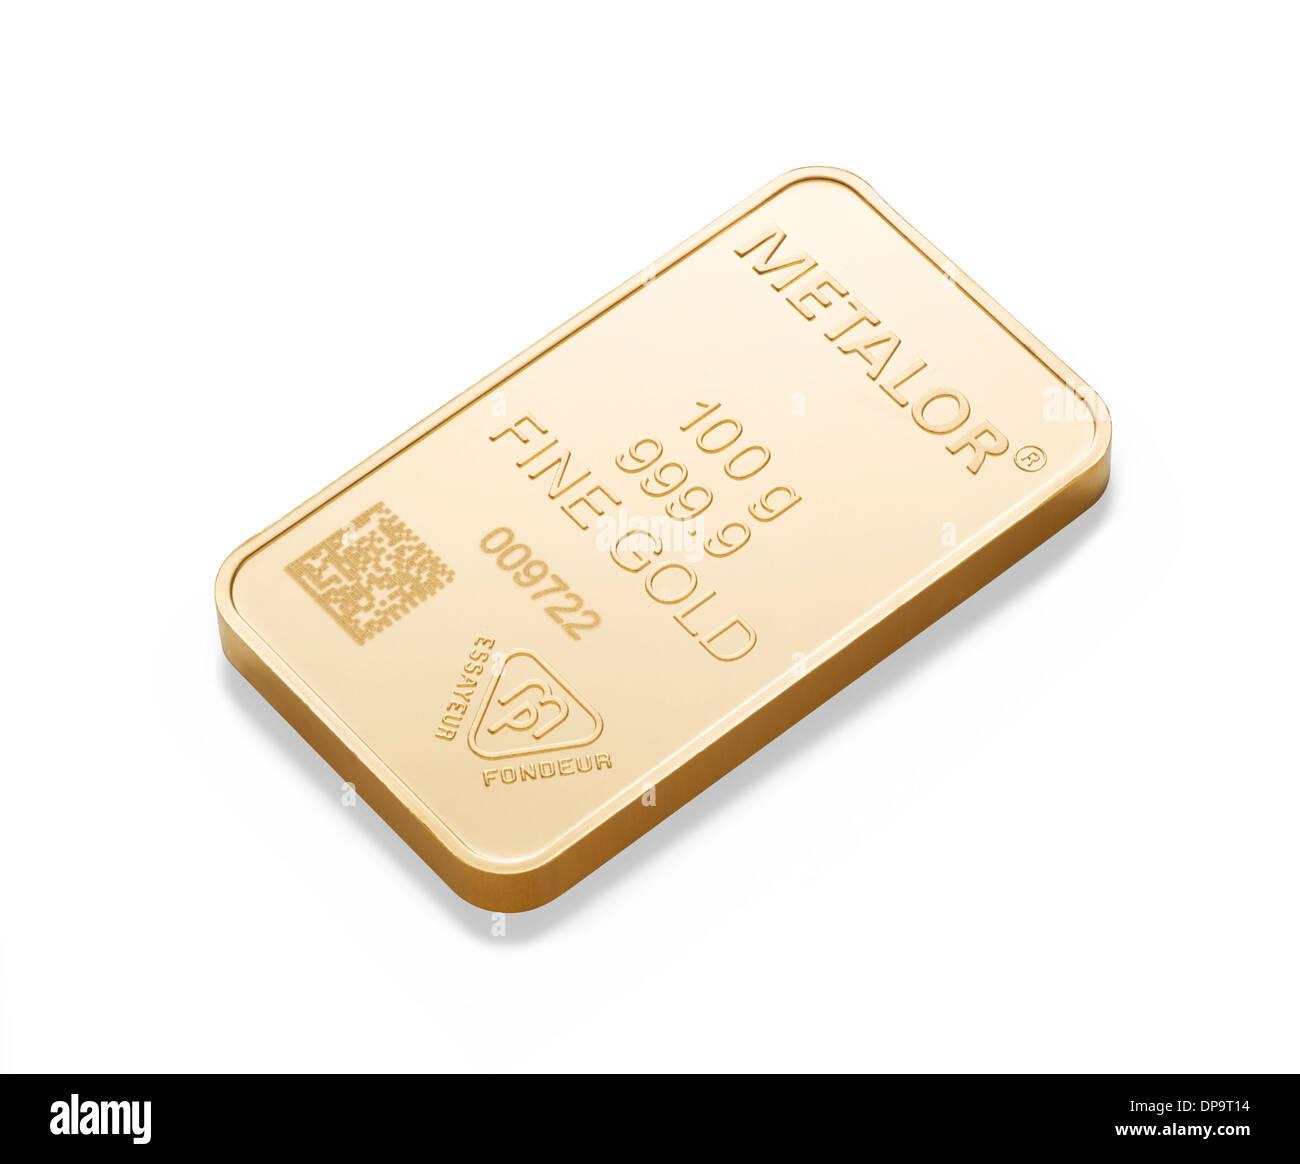 100g gold bar on white background - Stock Image